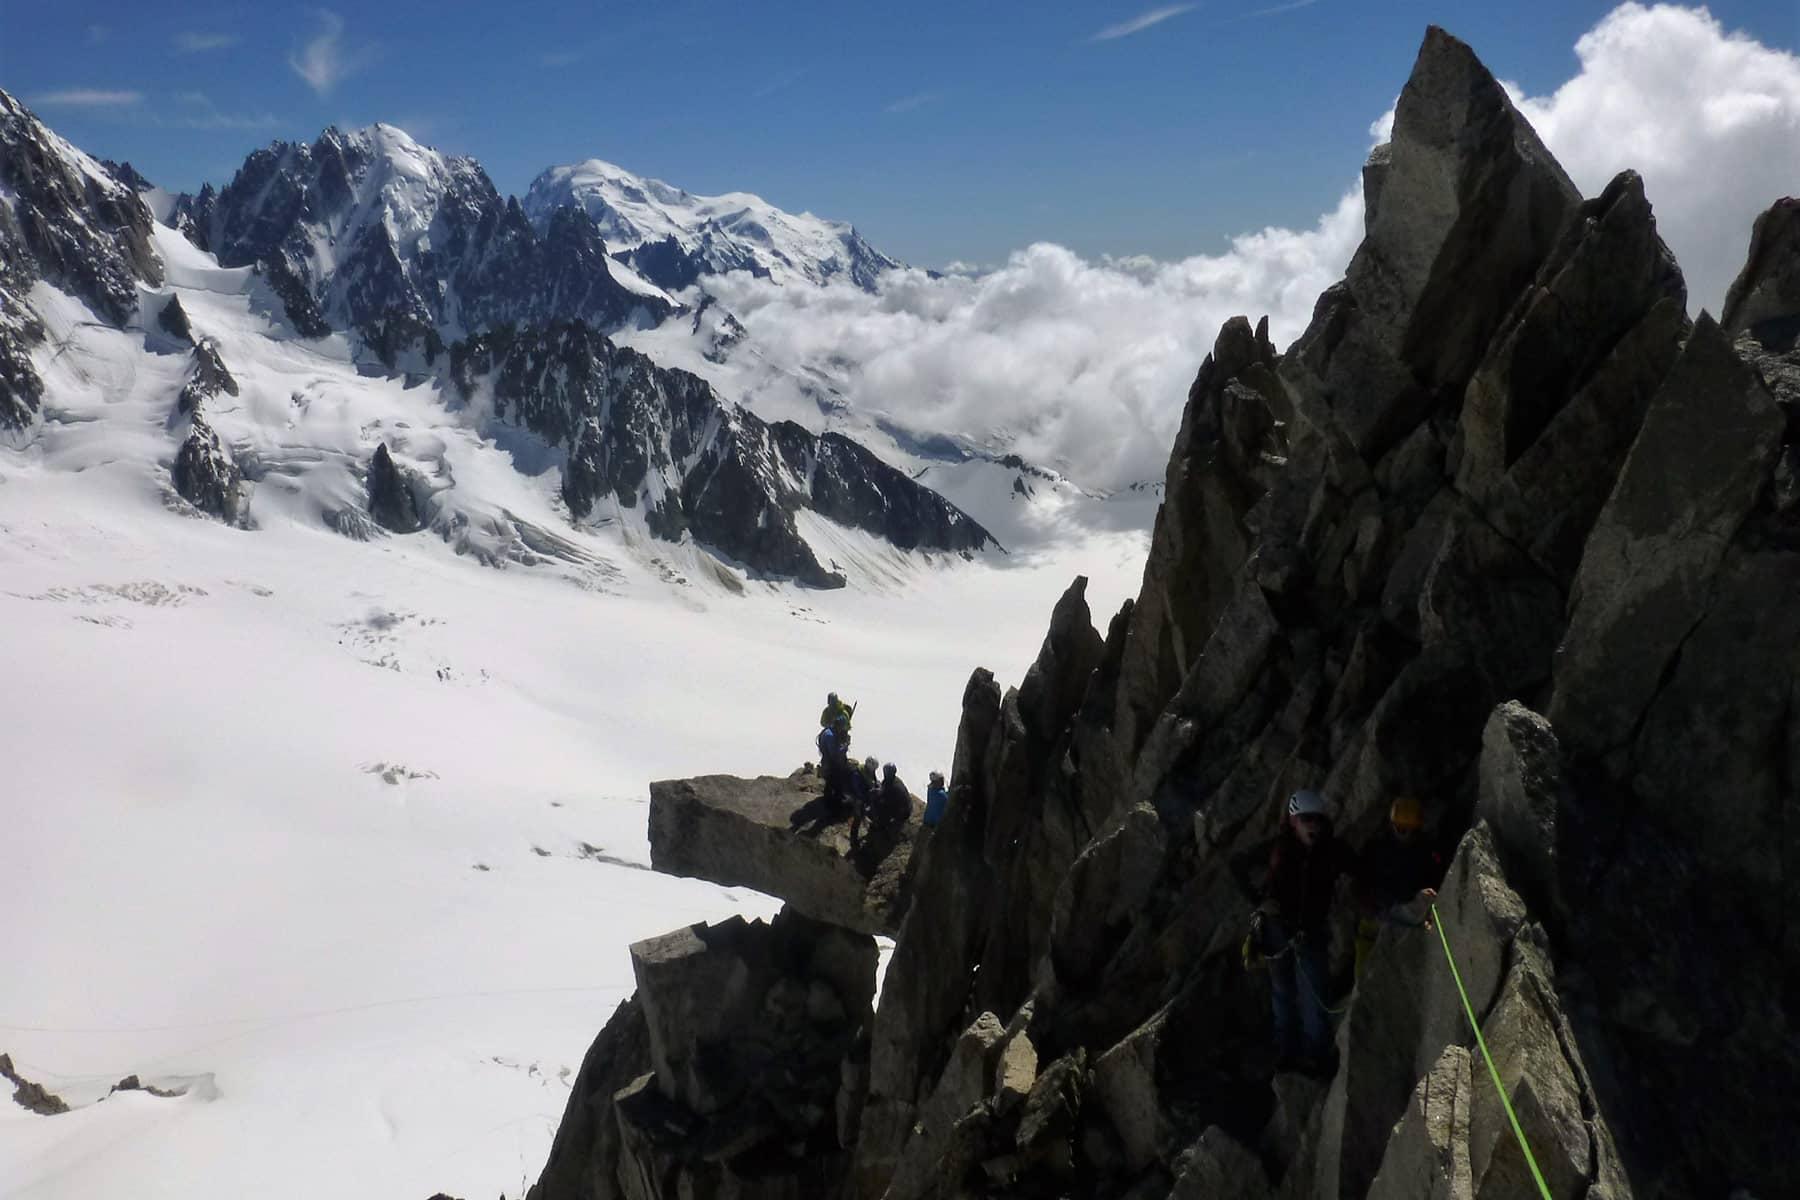 Summer mountaineering custom trips in Germany, Austria, Italy or Switzerland